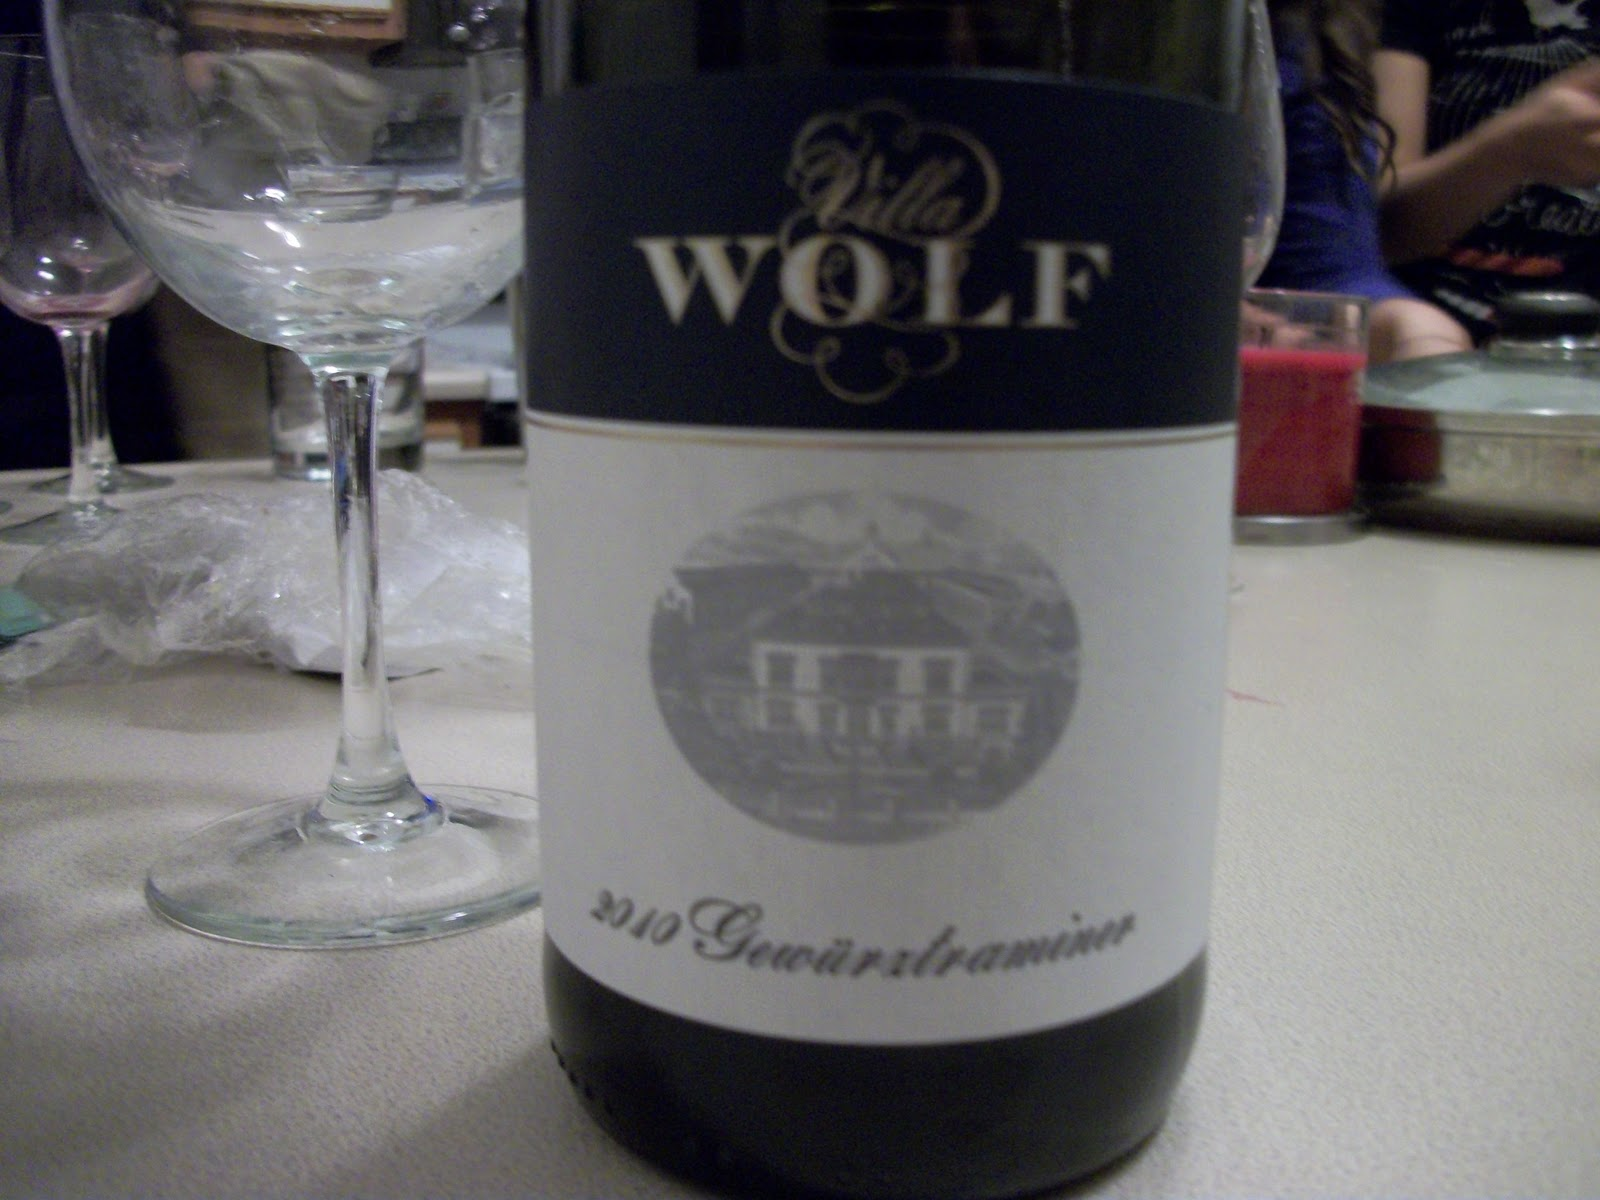 Ashley S Wine Blog Tasting Villa Wolf Gewurztraminer